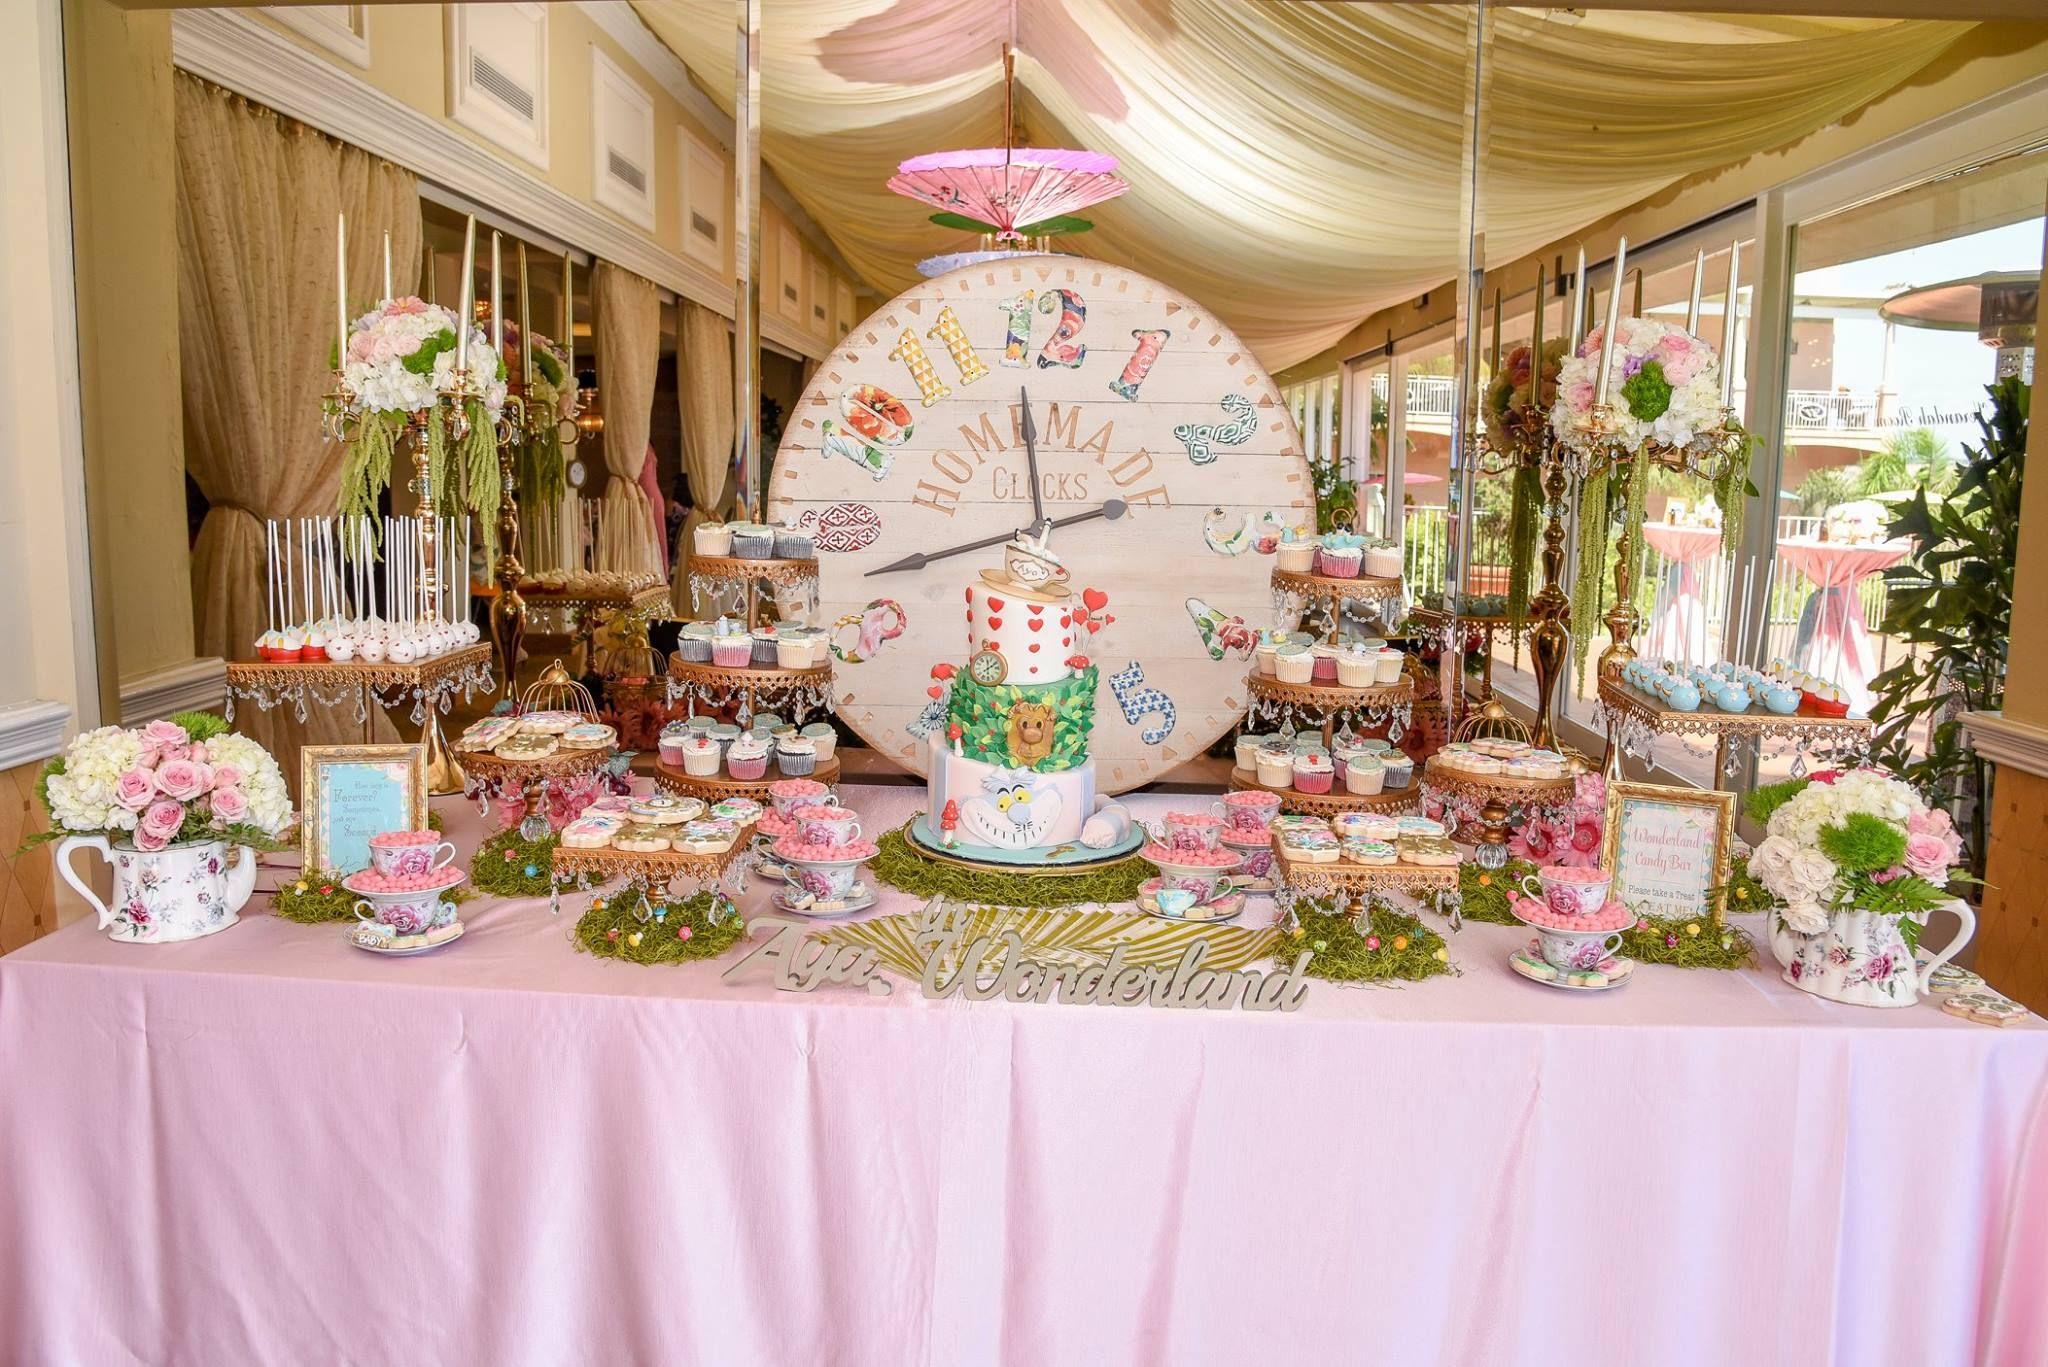 Alice In Wonderland Baby Shower Ideas Alice In Wonderland Birthday Party I Alice In Wonderland Birthday Wonderland Party Invitations Onederland Birthday Party